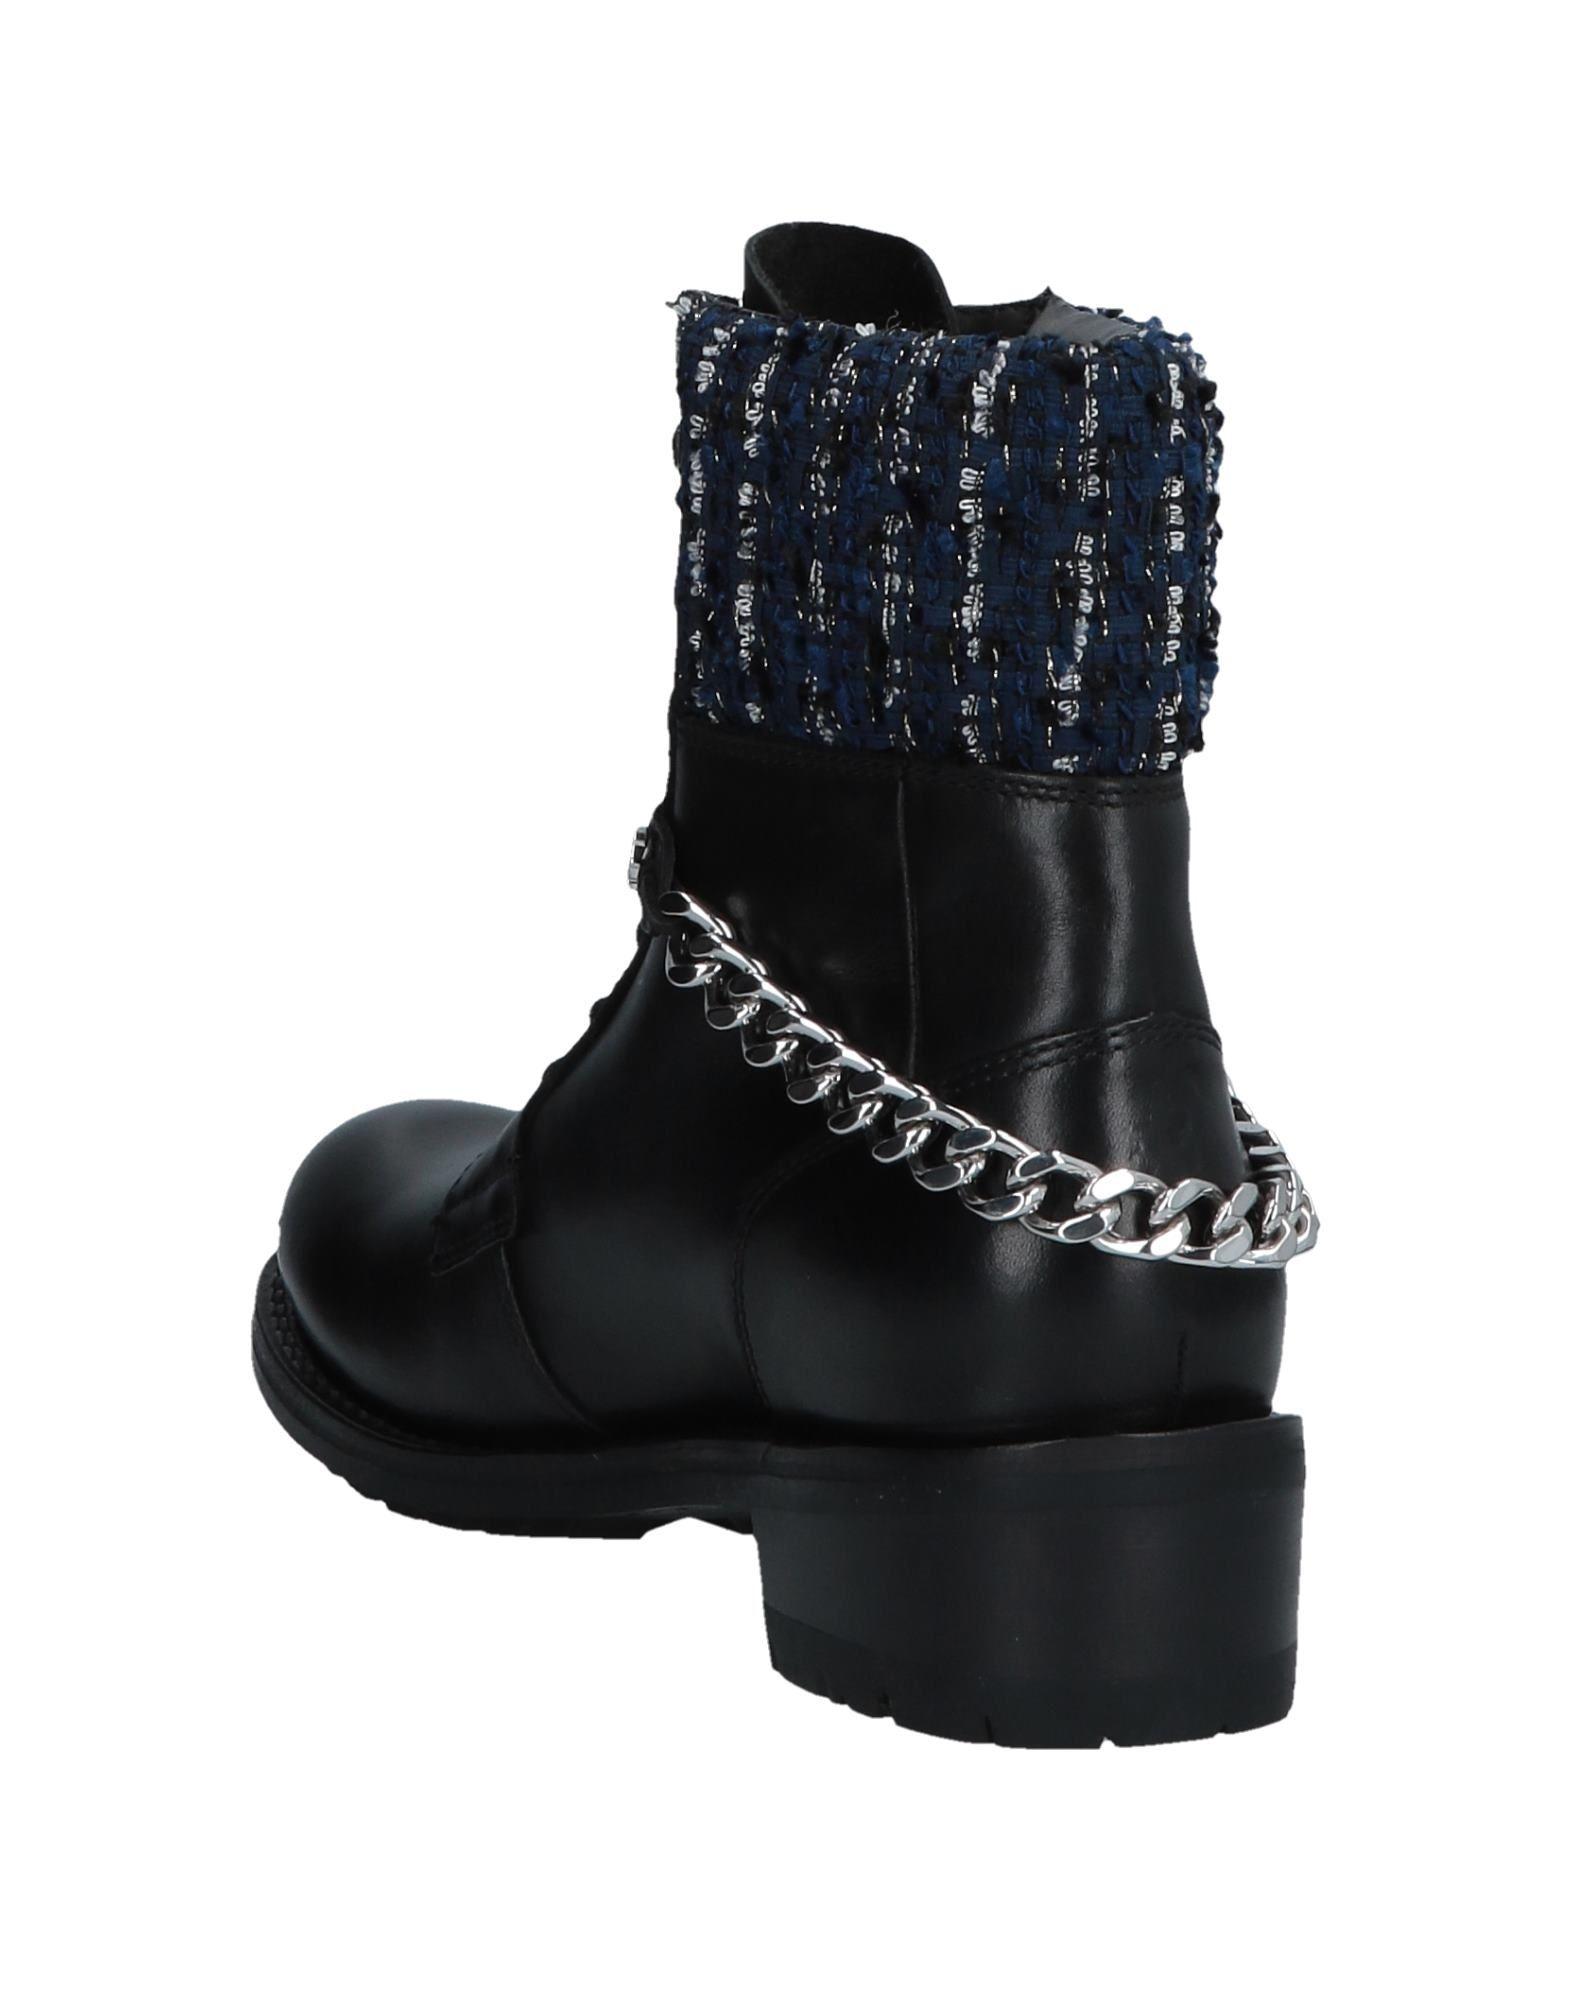 Stilvolle billige Schuhe Karl 11551619ET Lagerfeld Stiefelette Damen  11551619ET Karl d623d8